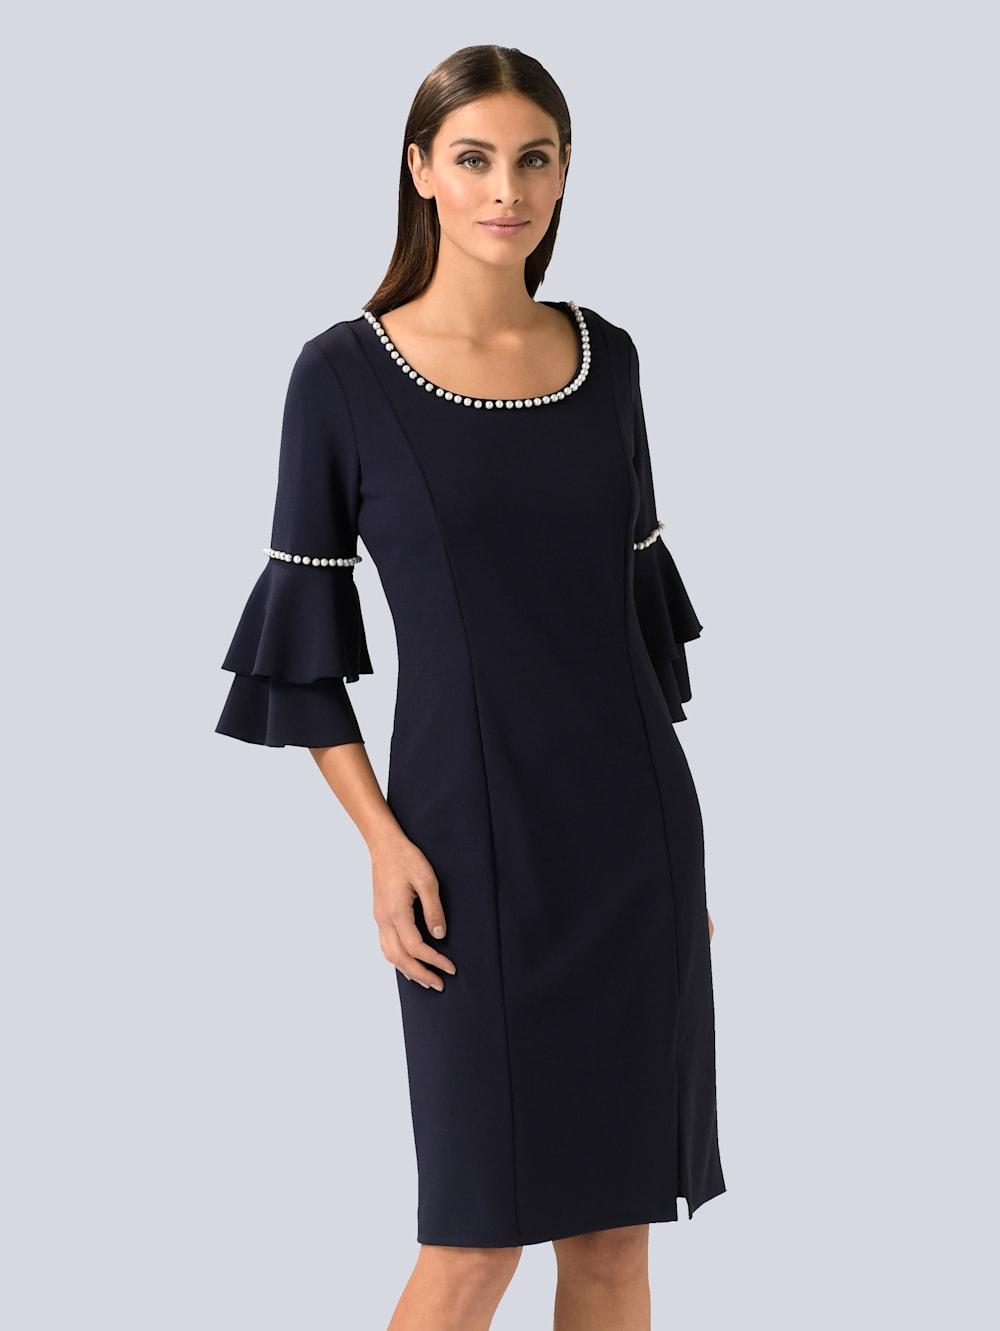 alba moda kleid mit femininen perlen verziert | alba moda